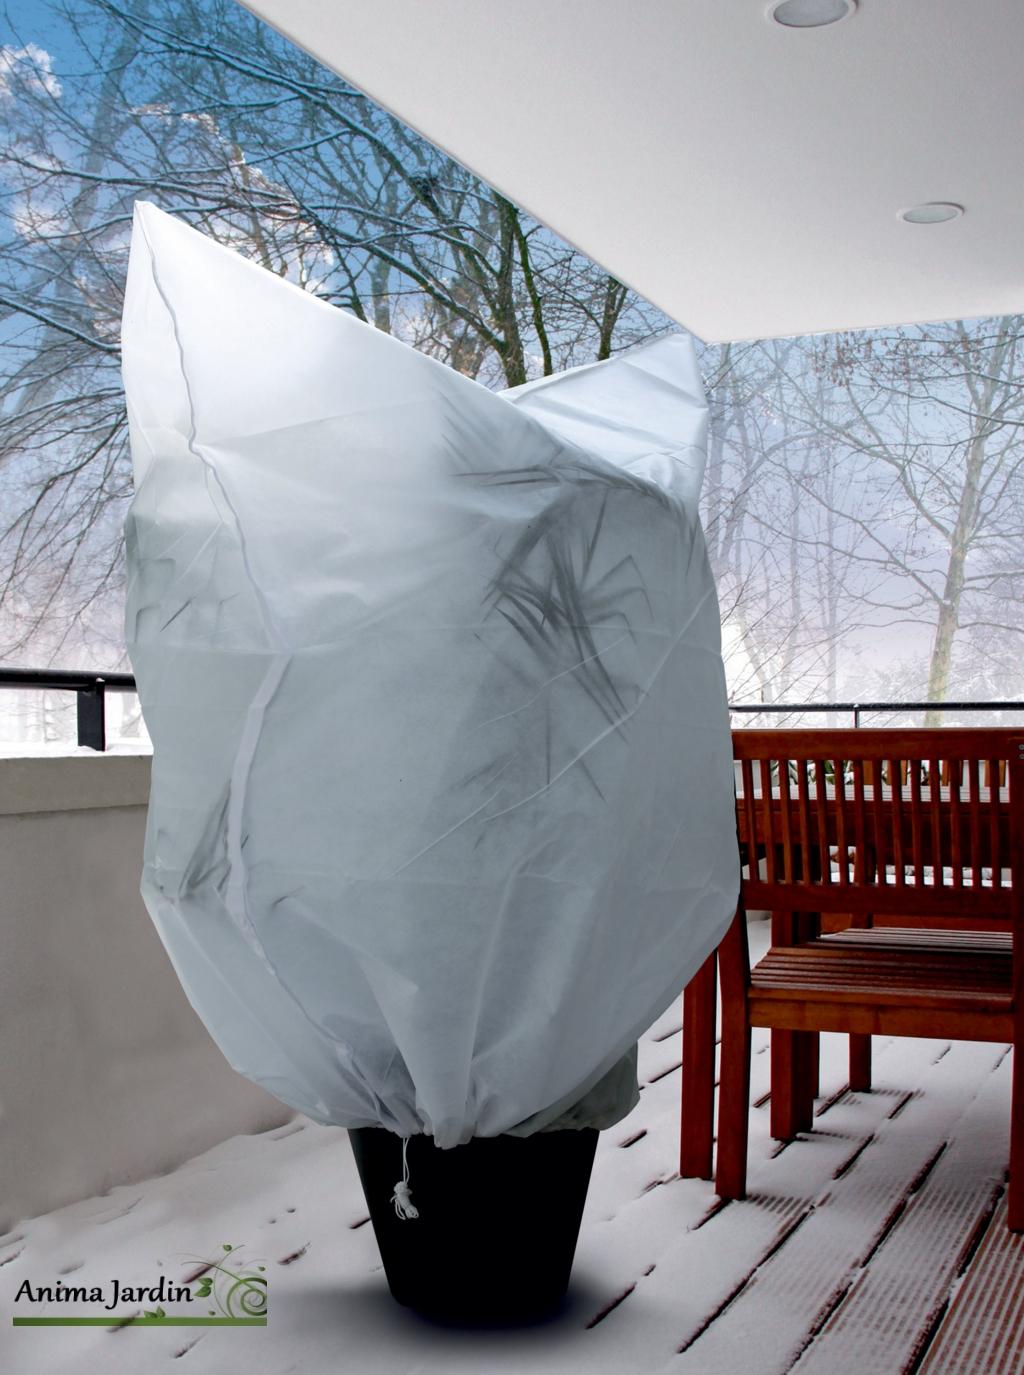 Housse-protection-froid-nortène-anima-jardin-hiverscratch